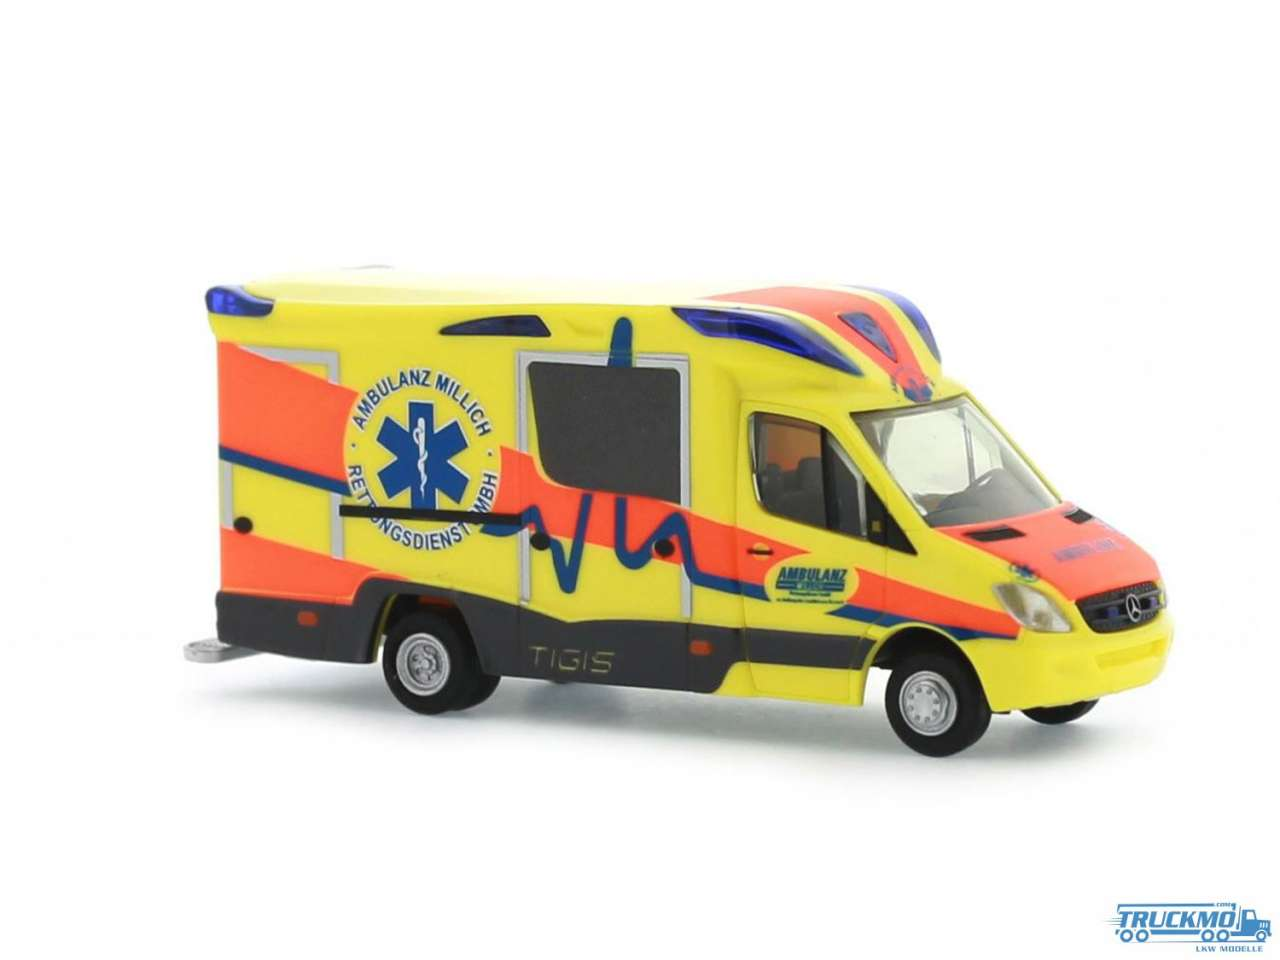 Rietze Ambulanz Millich Mercedes Benz Ambulanz Mobile Tigis Ergo 68622